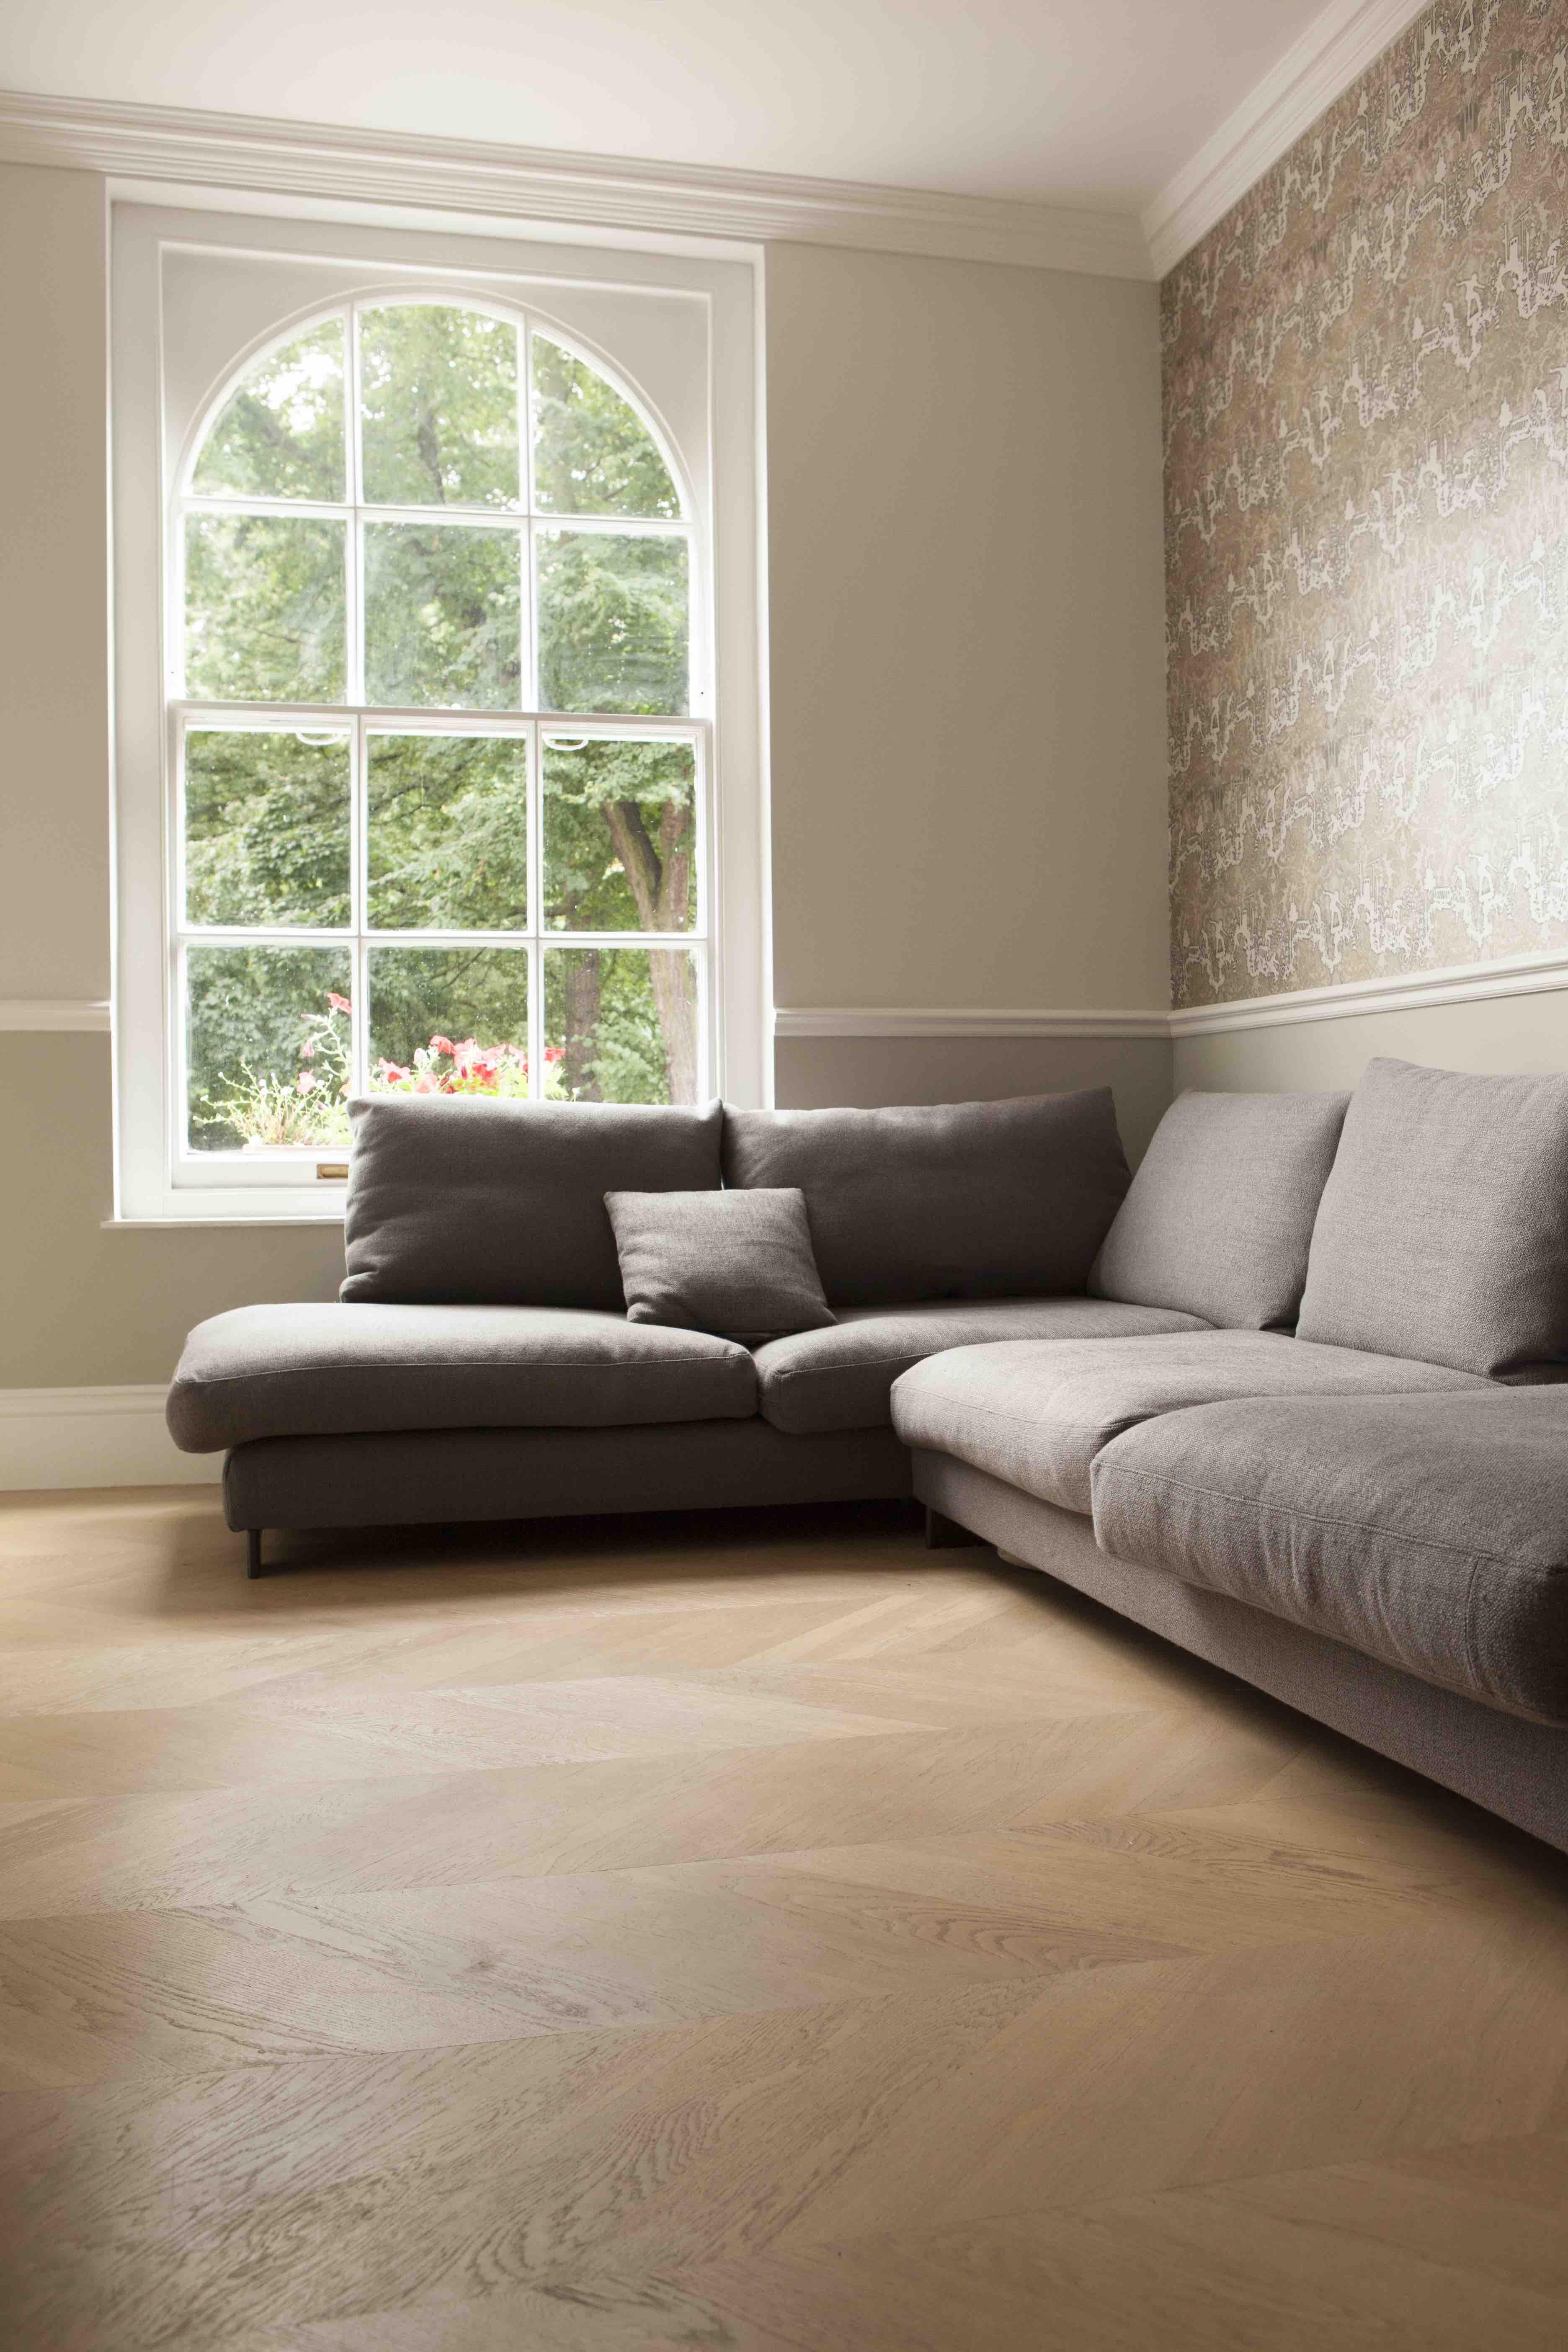 Our oak chevron flooring laid is a herringbone design